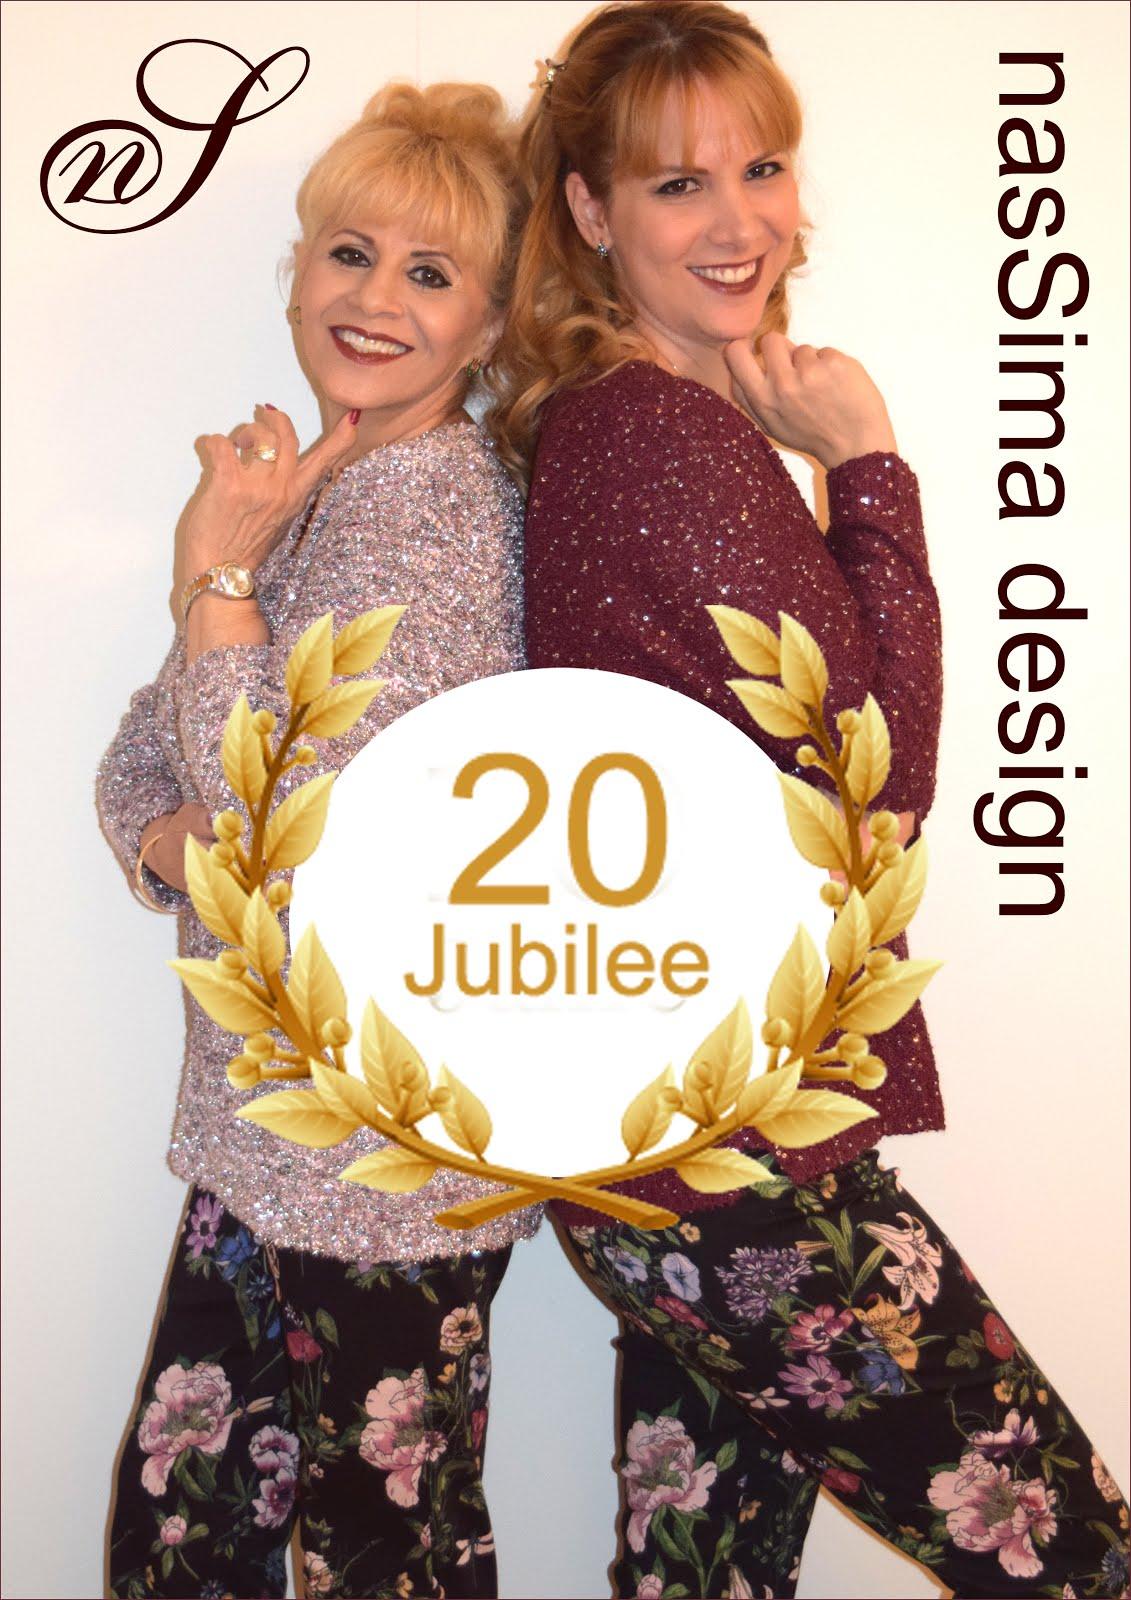 nasSima design 20 Jubilee